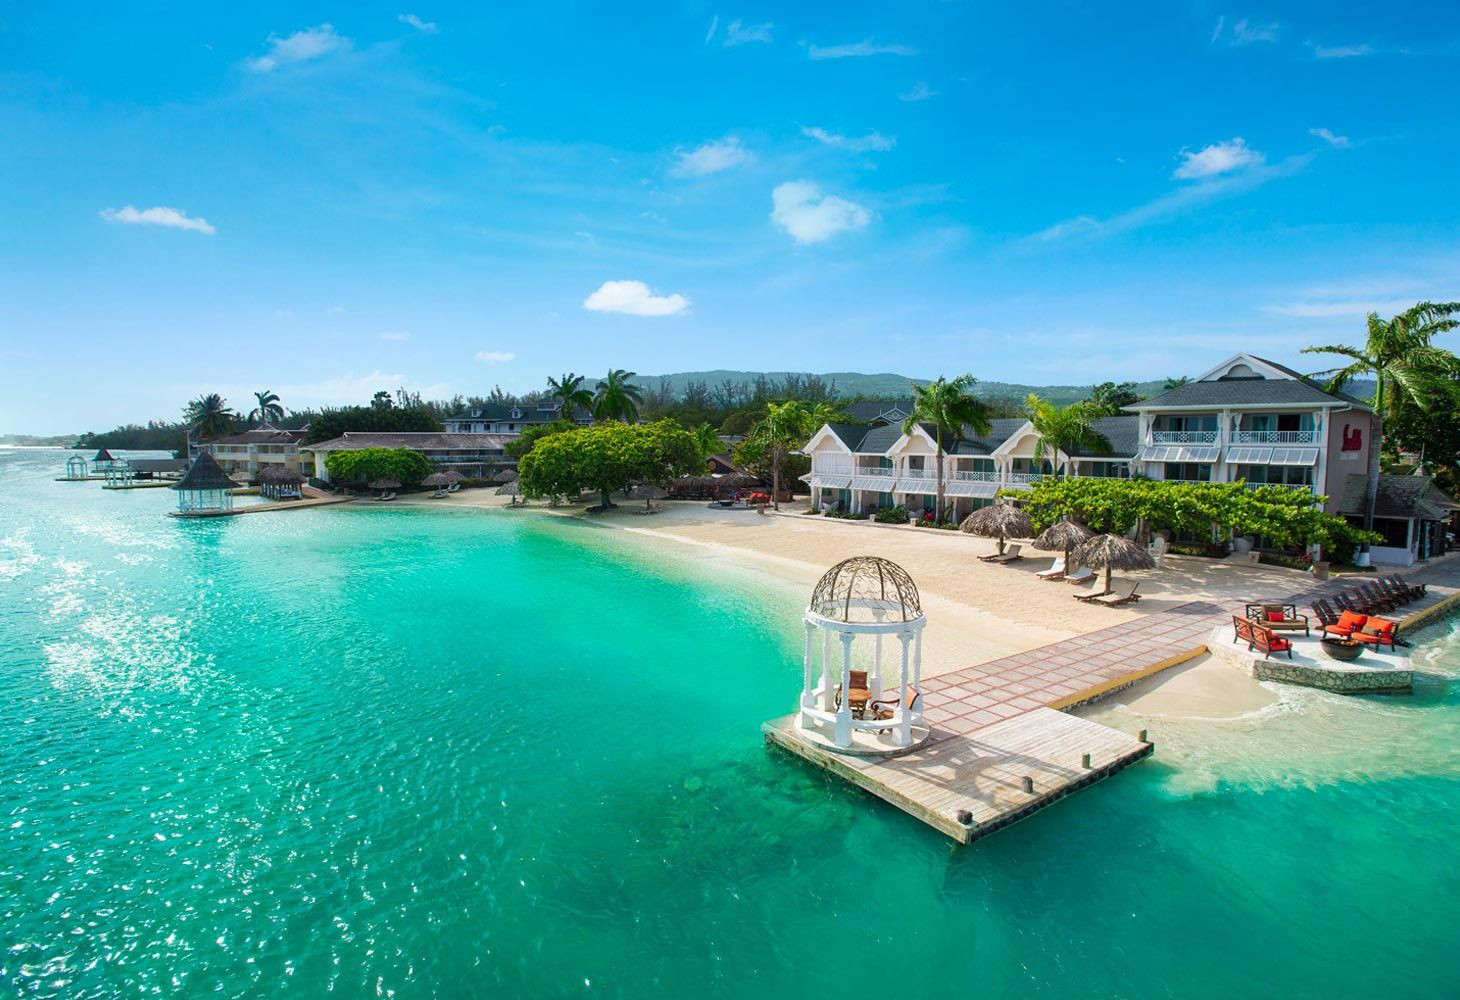 Sandals Royal Caribbean all-inclusive